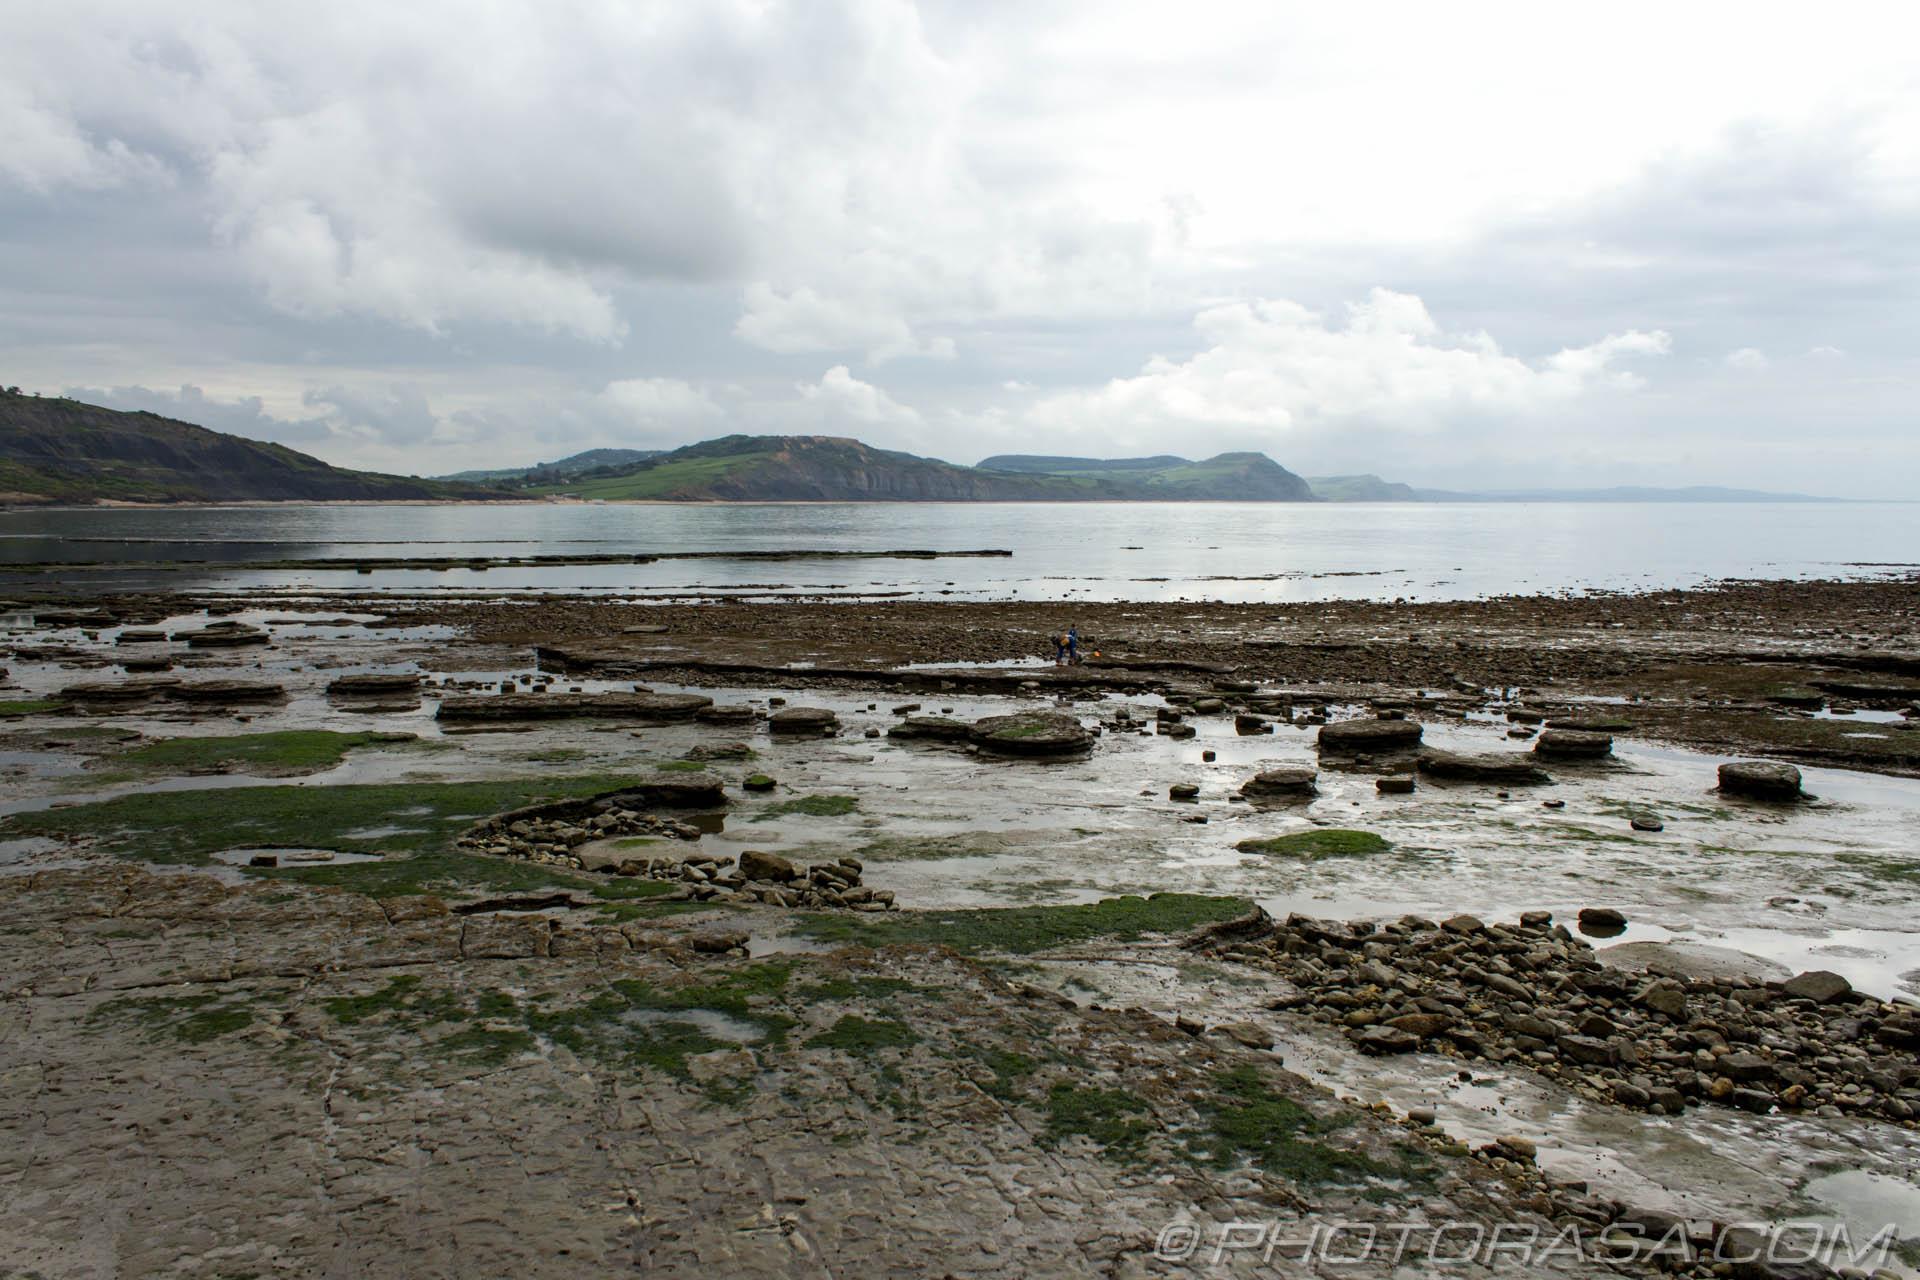 https://photorasa.com/jurassic-coast-lyme-regis/rocky-beach-landscape/